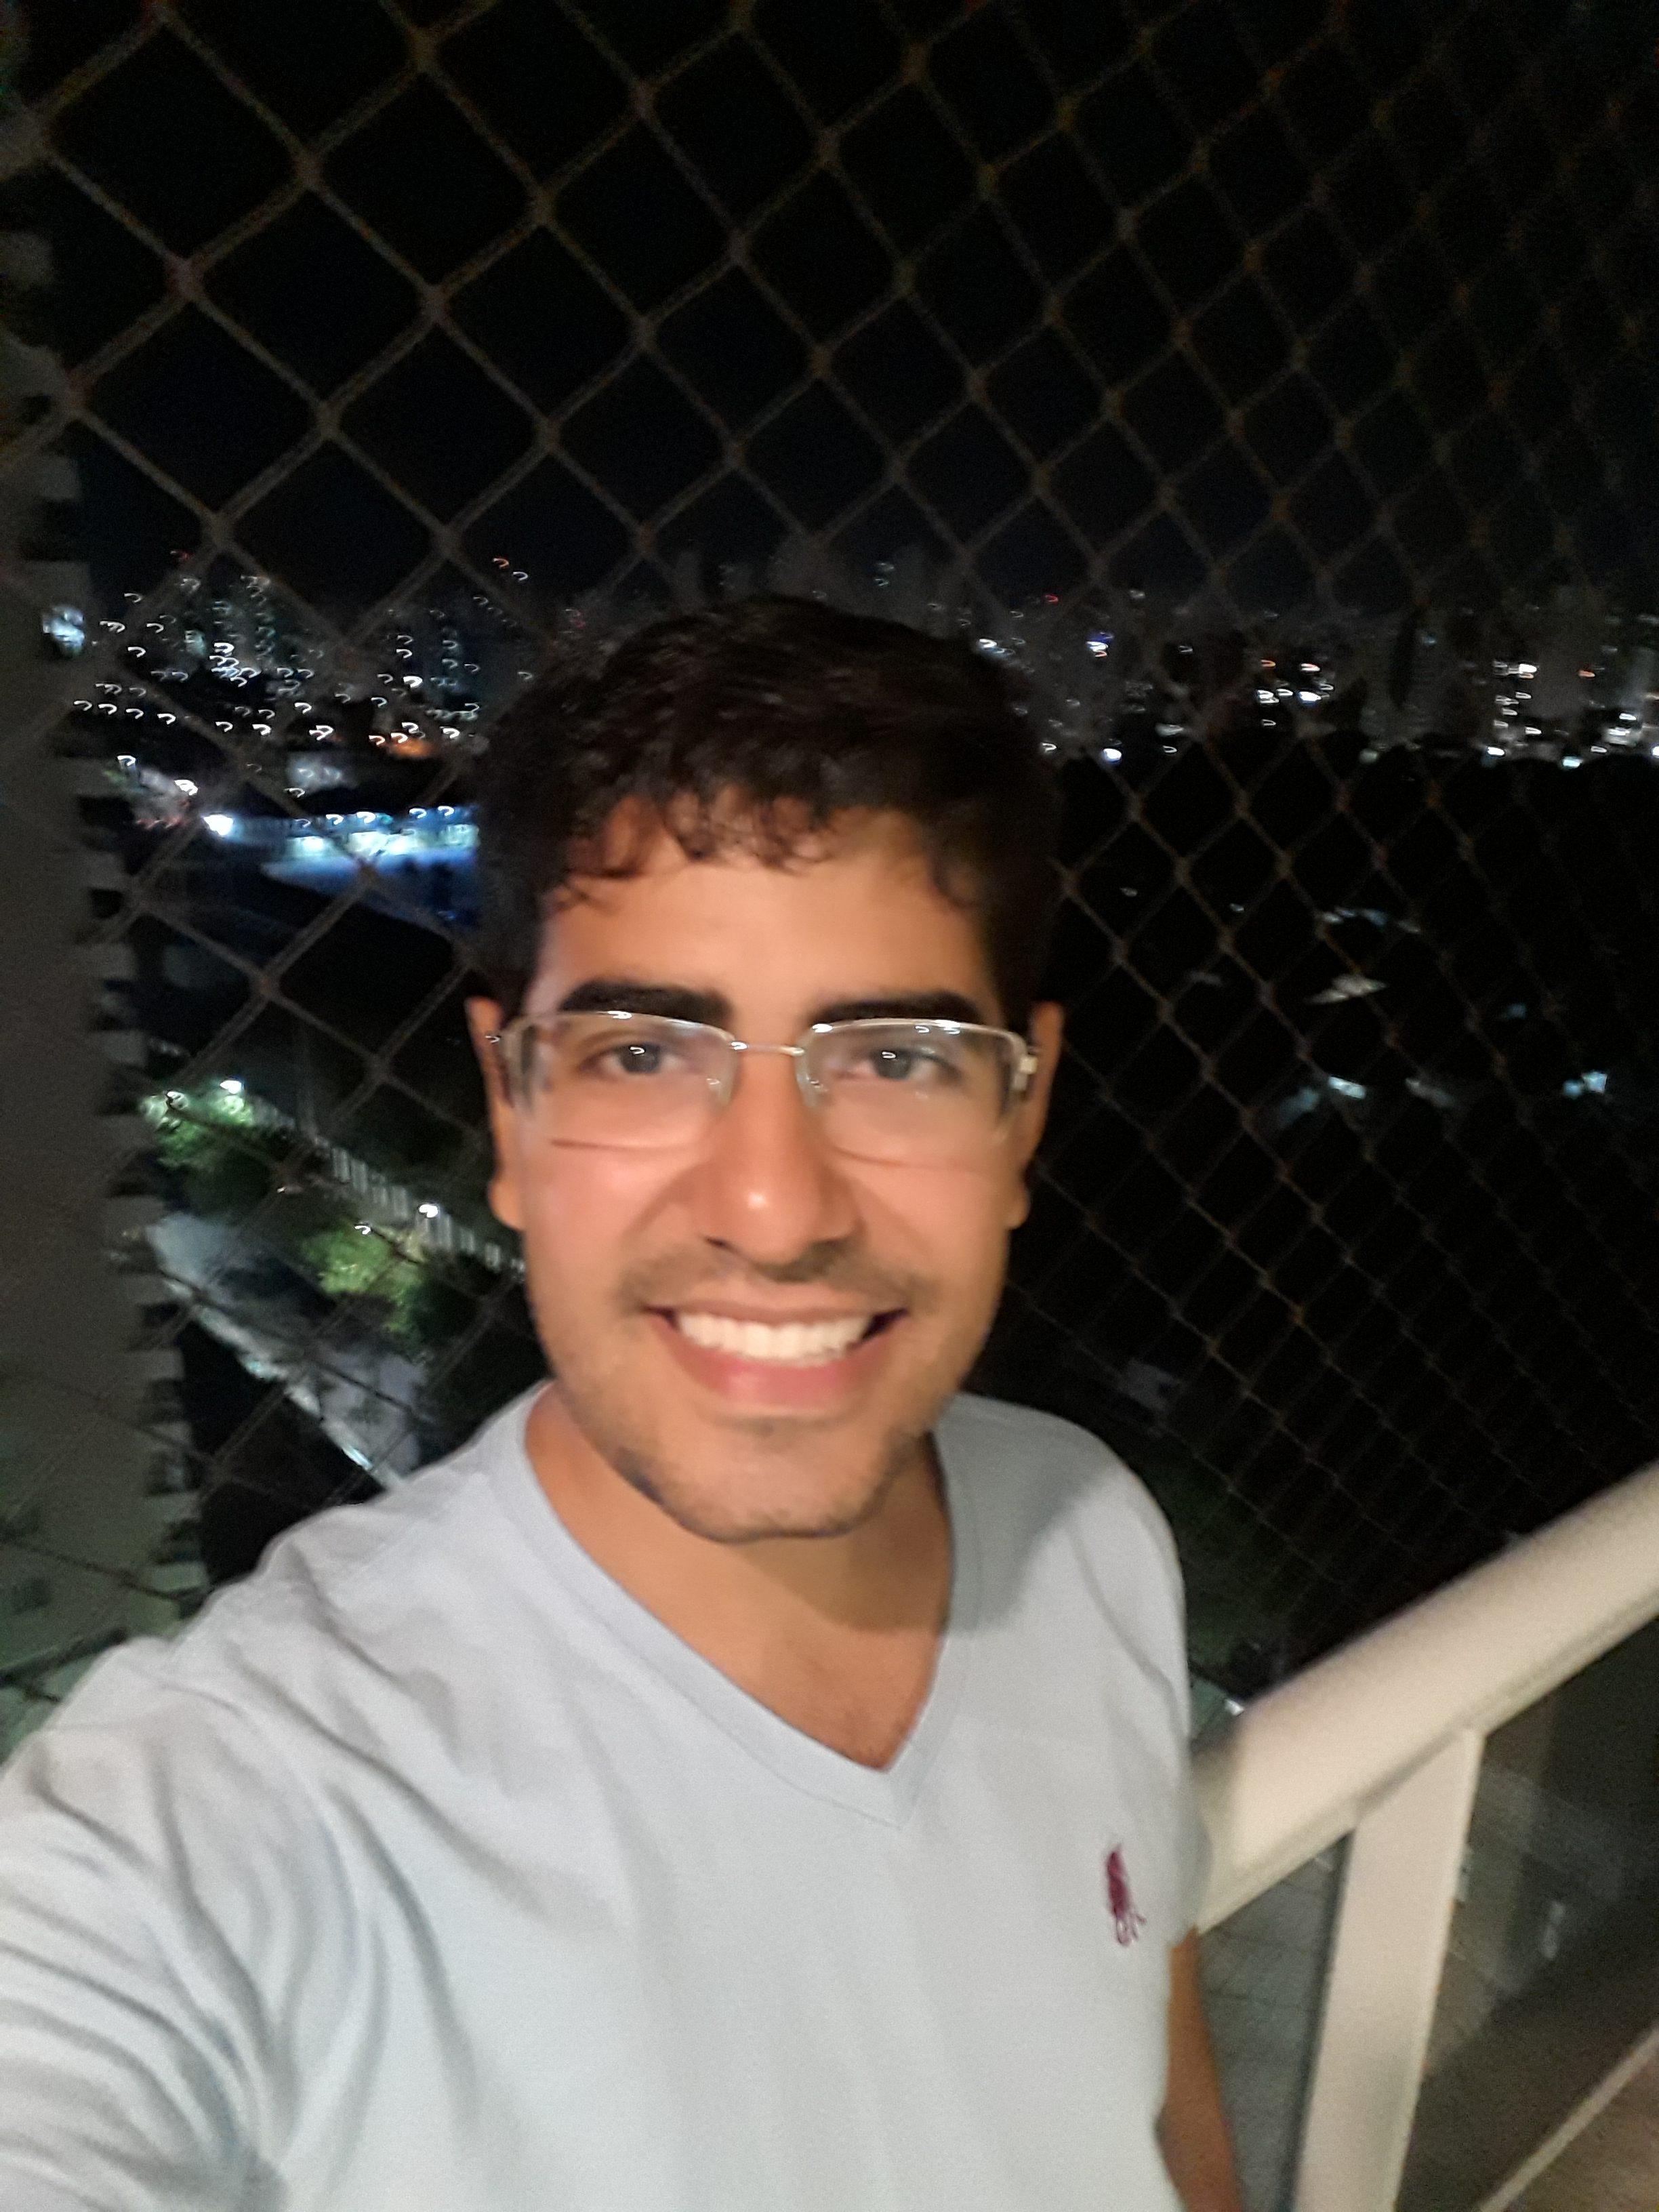 ENTREVISTA: Pedro Gadelha - Aprovado no concurso SEFAZ GO para o cargo de Auditor Fiscal da Receita Estadual